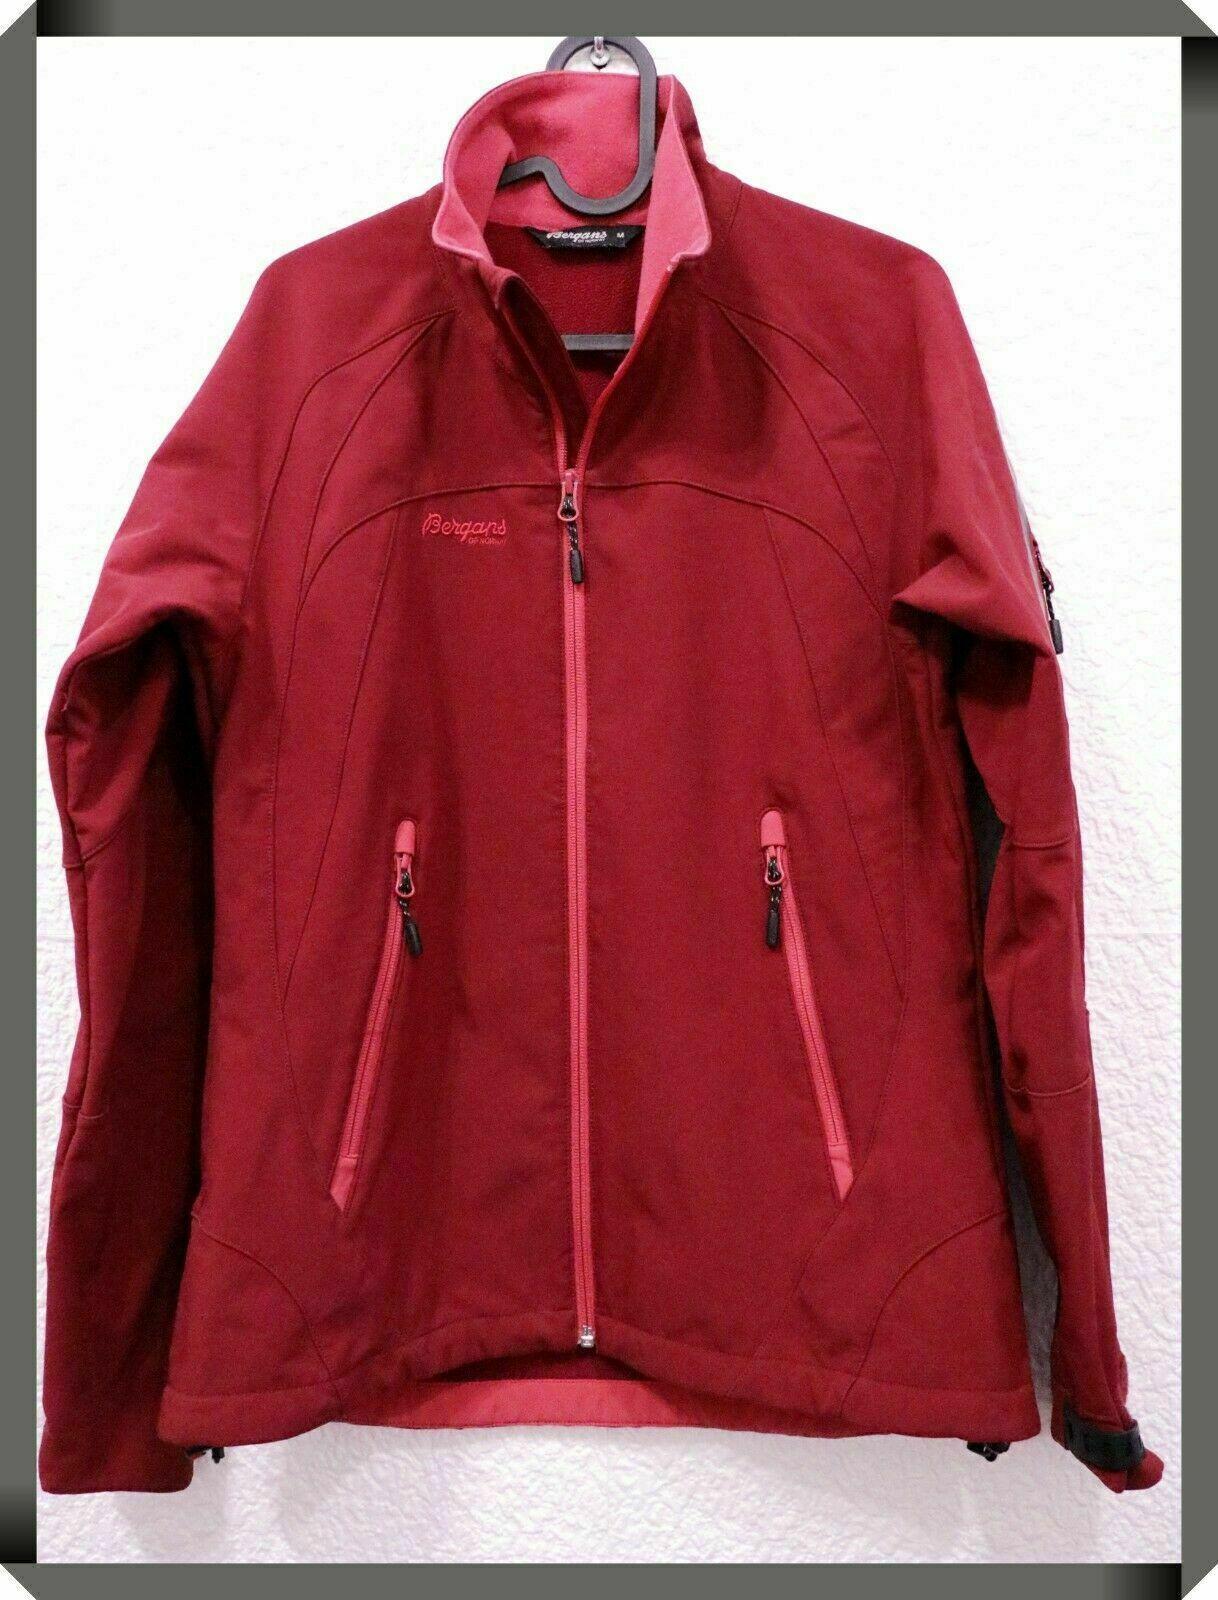 Bergans Of Norway Women's Jacket 1553 Stamsund II Lady Size M